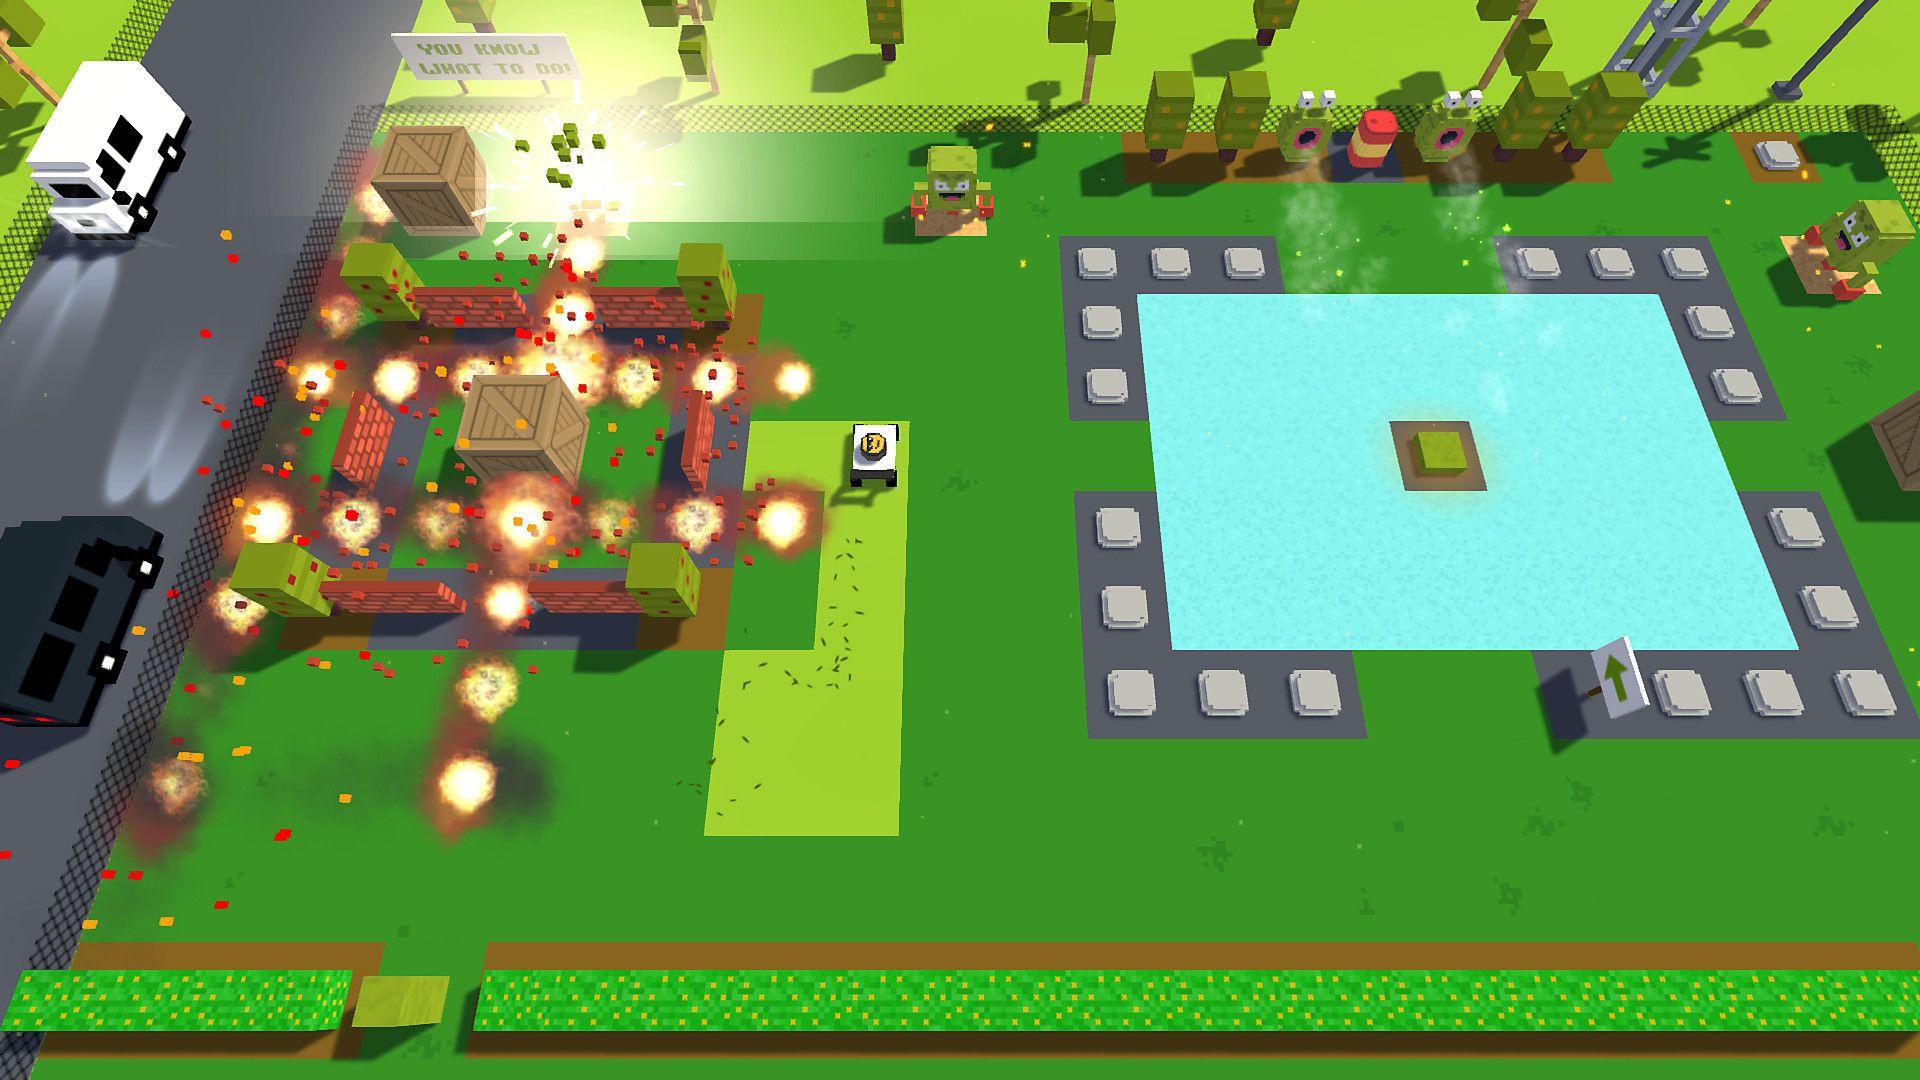 grass-cutter-mutated-lawns-screenshot-01-ps4-us-10july2019?$native_nt$